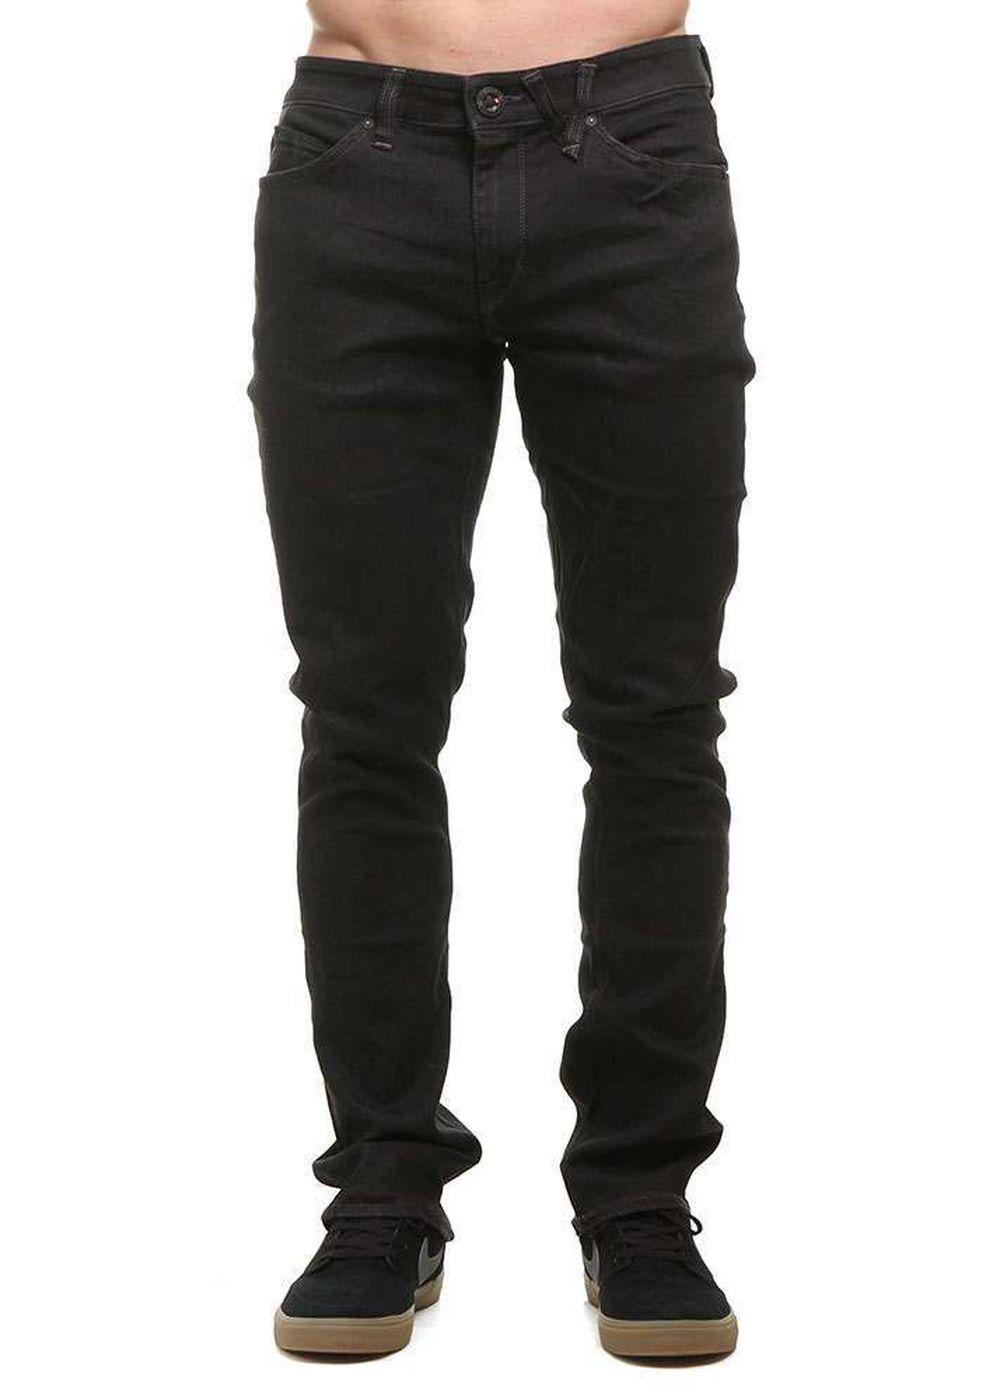 volcom-vorta-jeans-black-rinse